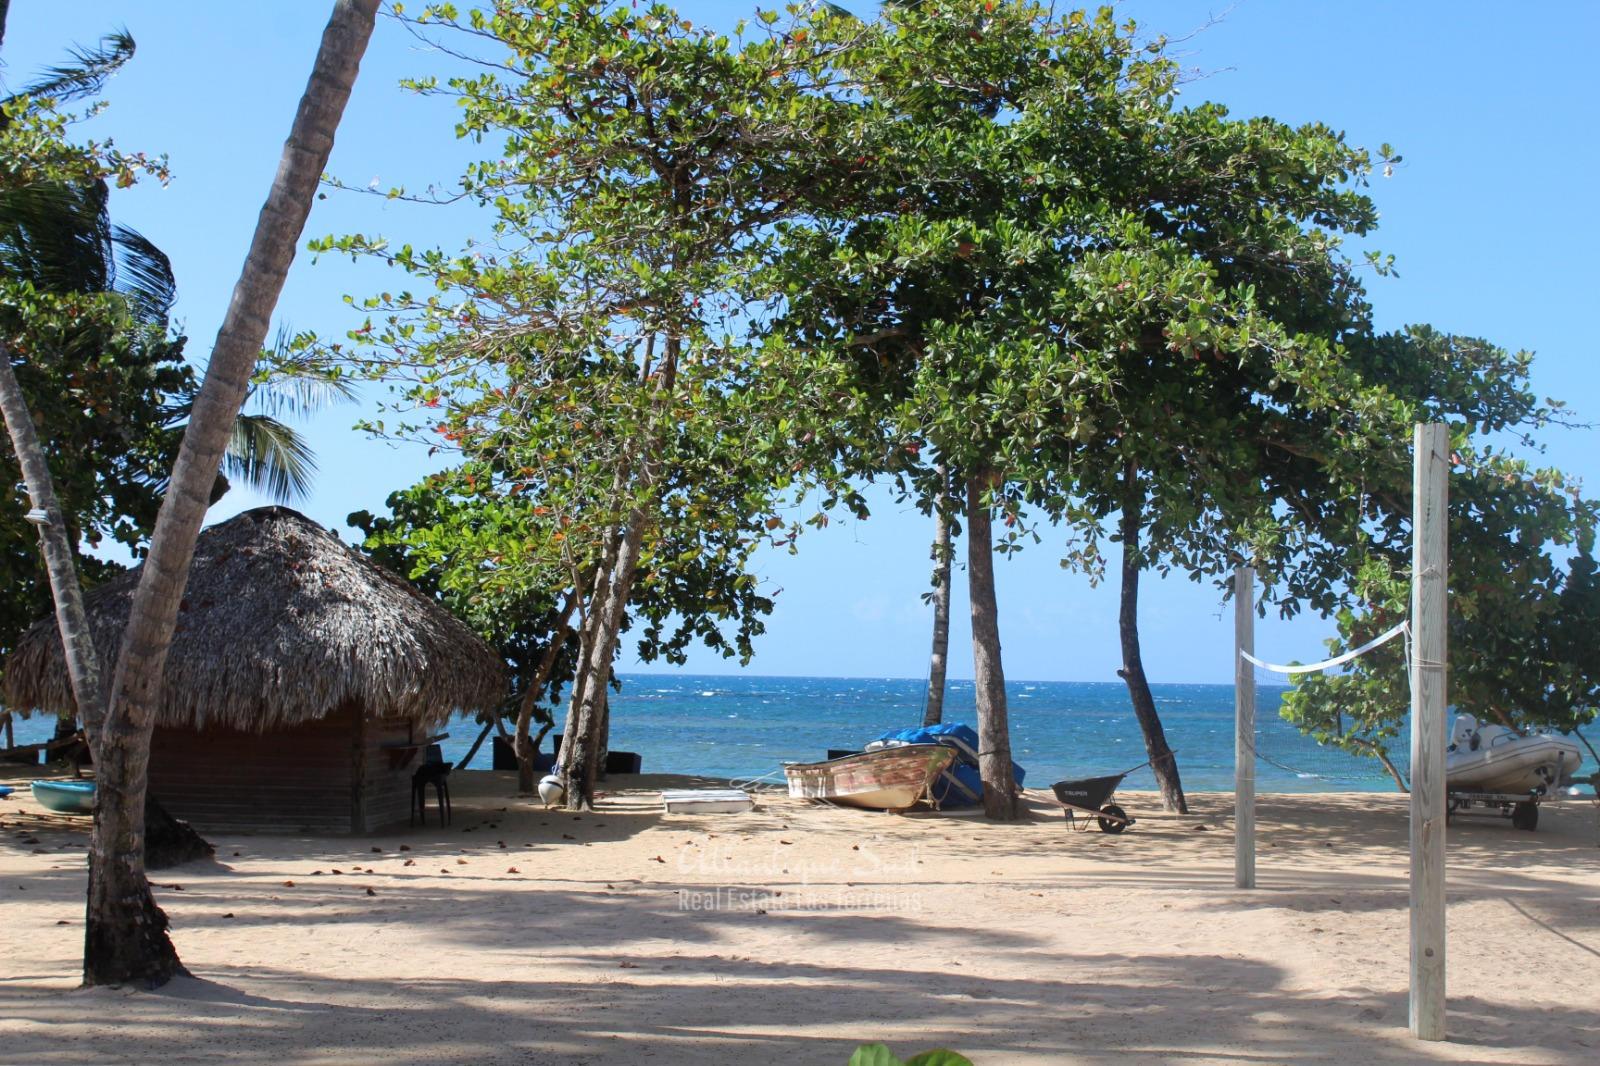 Apartments near the beach real estate las terrenas dominican republic56.jpg